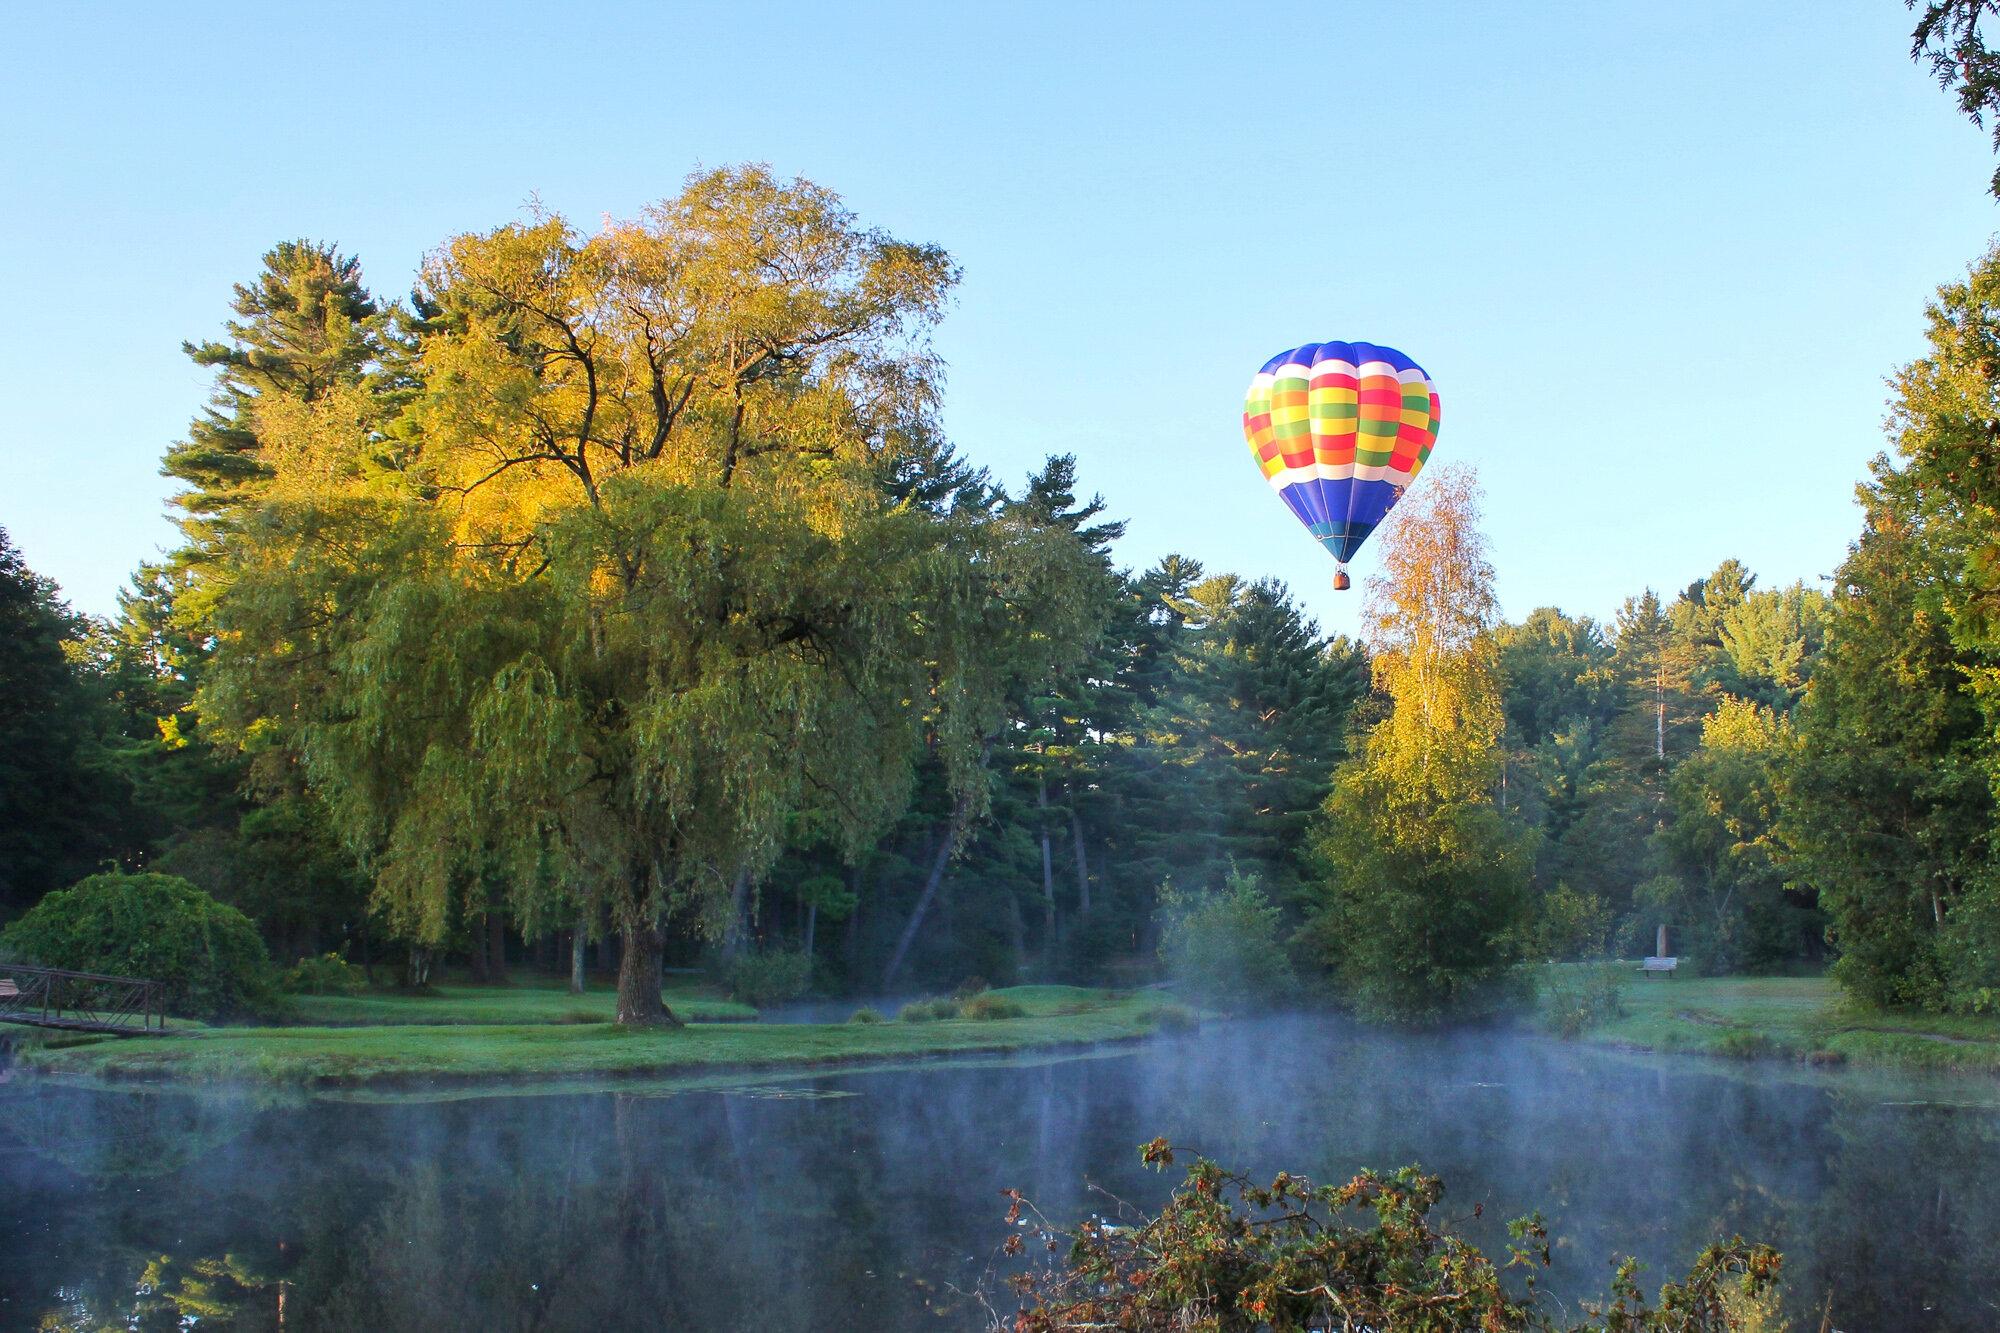 Hot Air Balloon Crandall Park Glens Falls